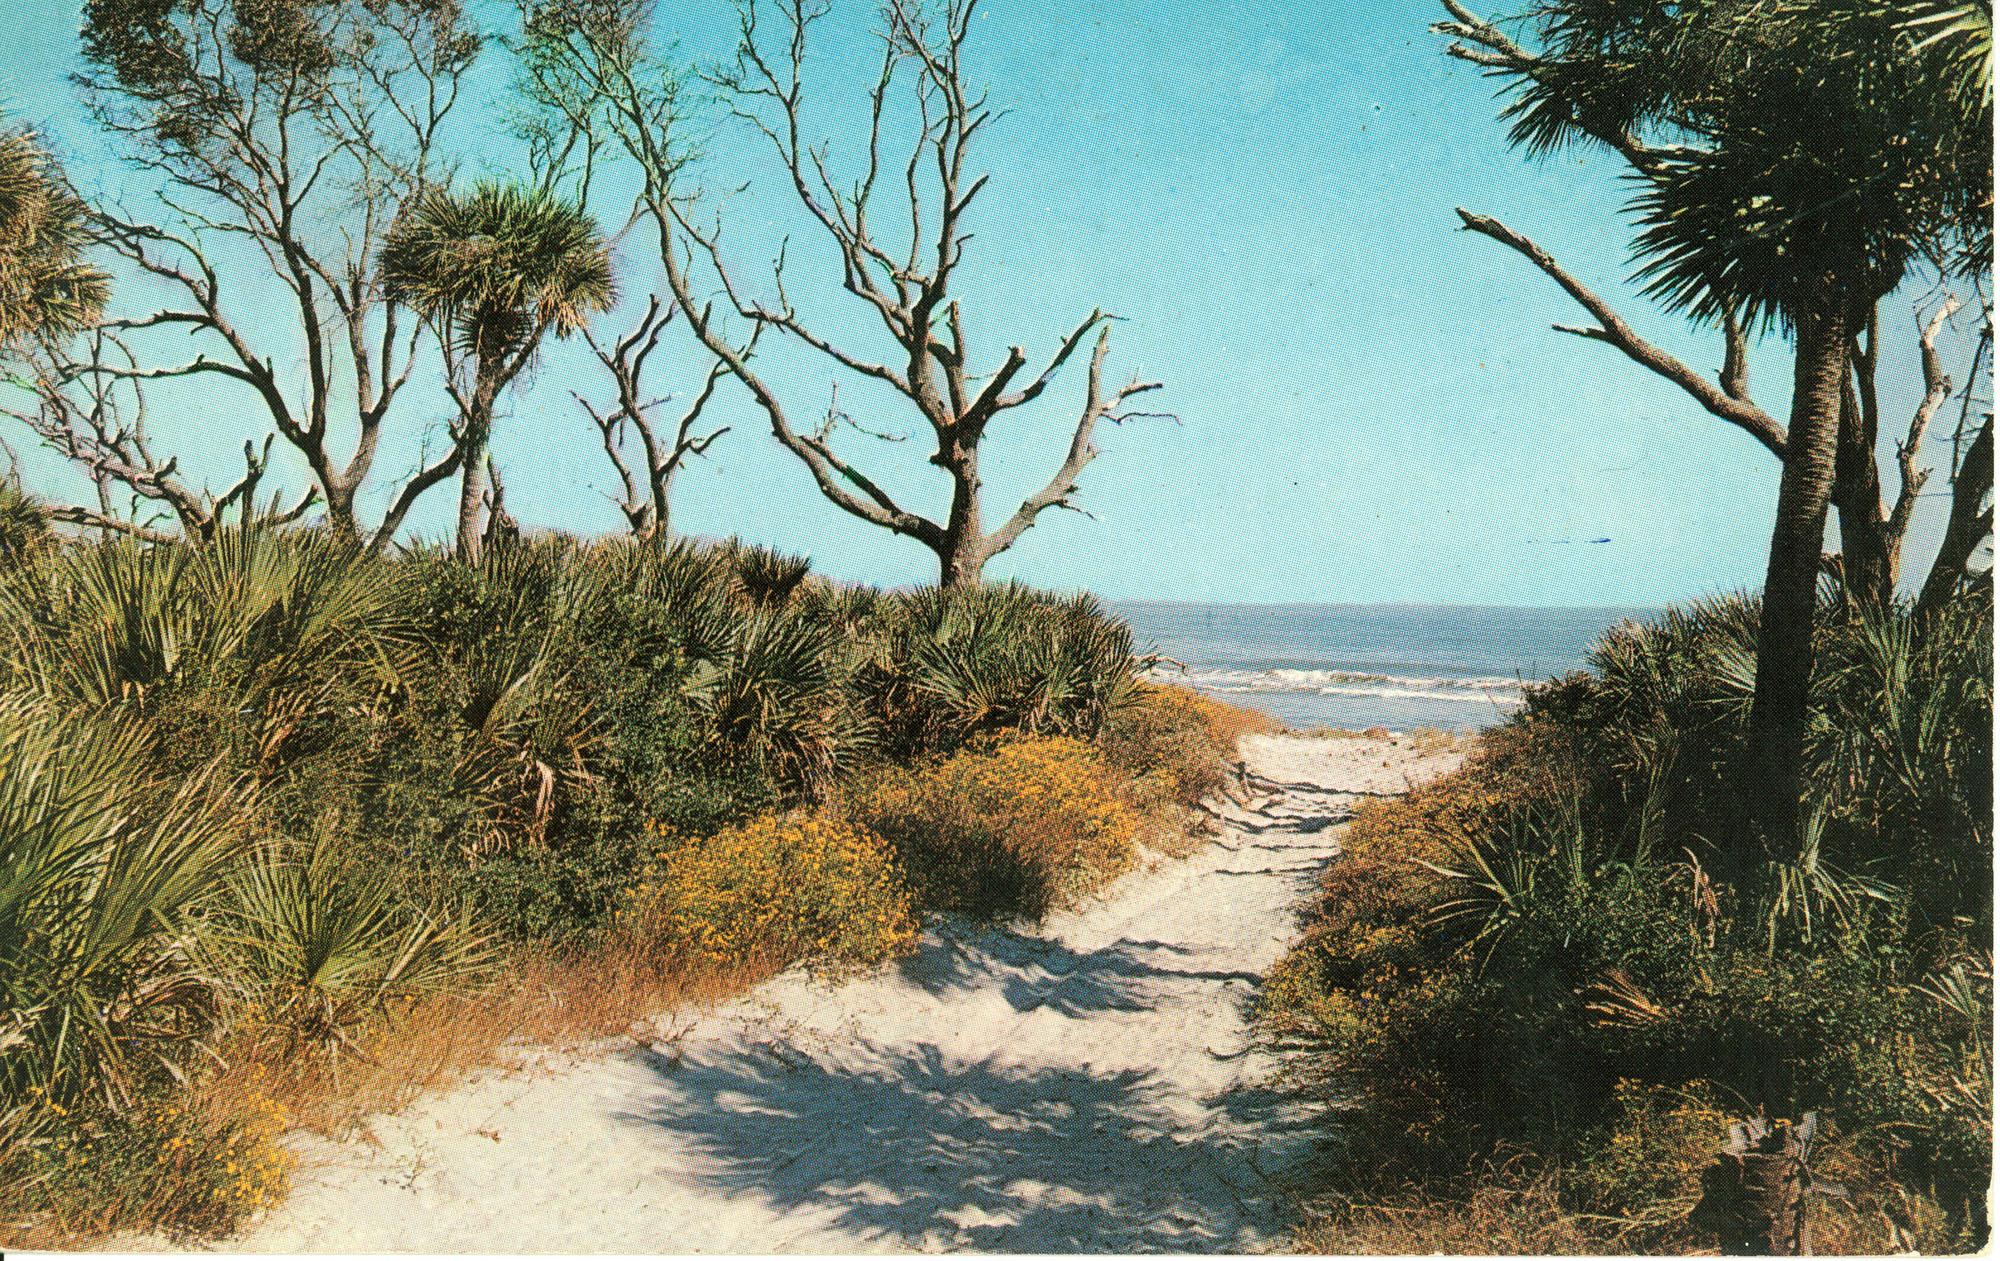 Coastal Scene - Beaufort County, S.C.